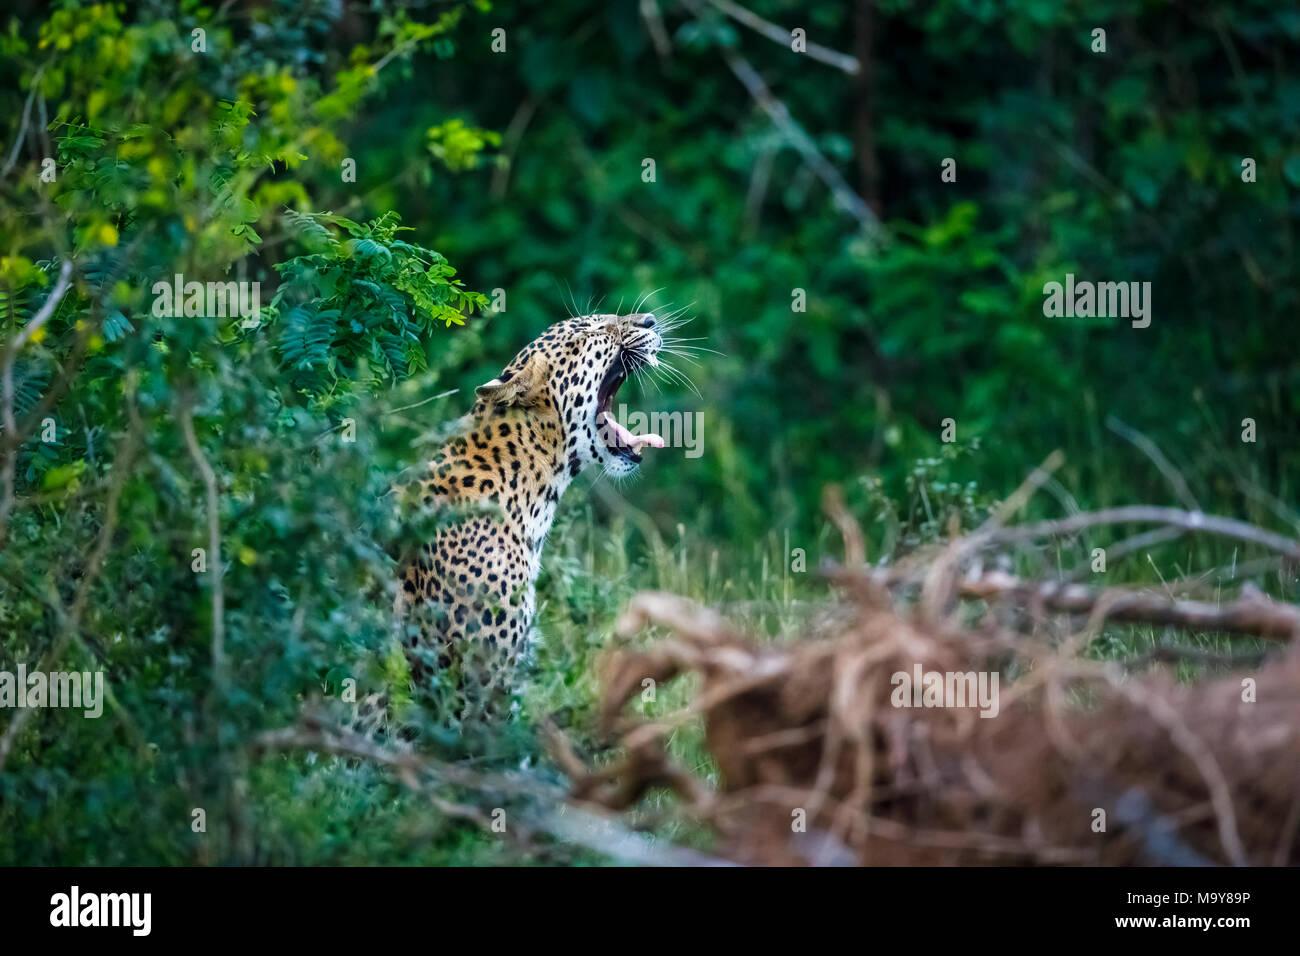 Female leopard (Panthera pardus) in green jungle woodland yawning with tongue out, Kumana National Park, Eastern Province, Sri Lanka - Stock Image